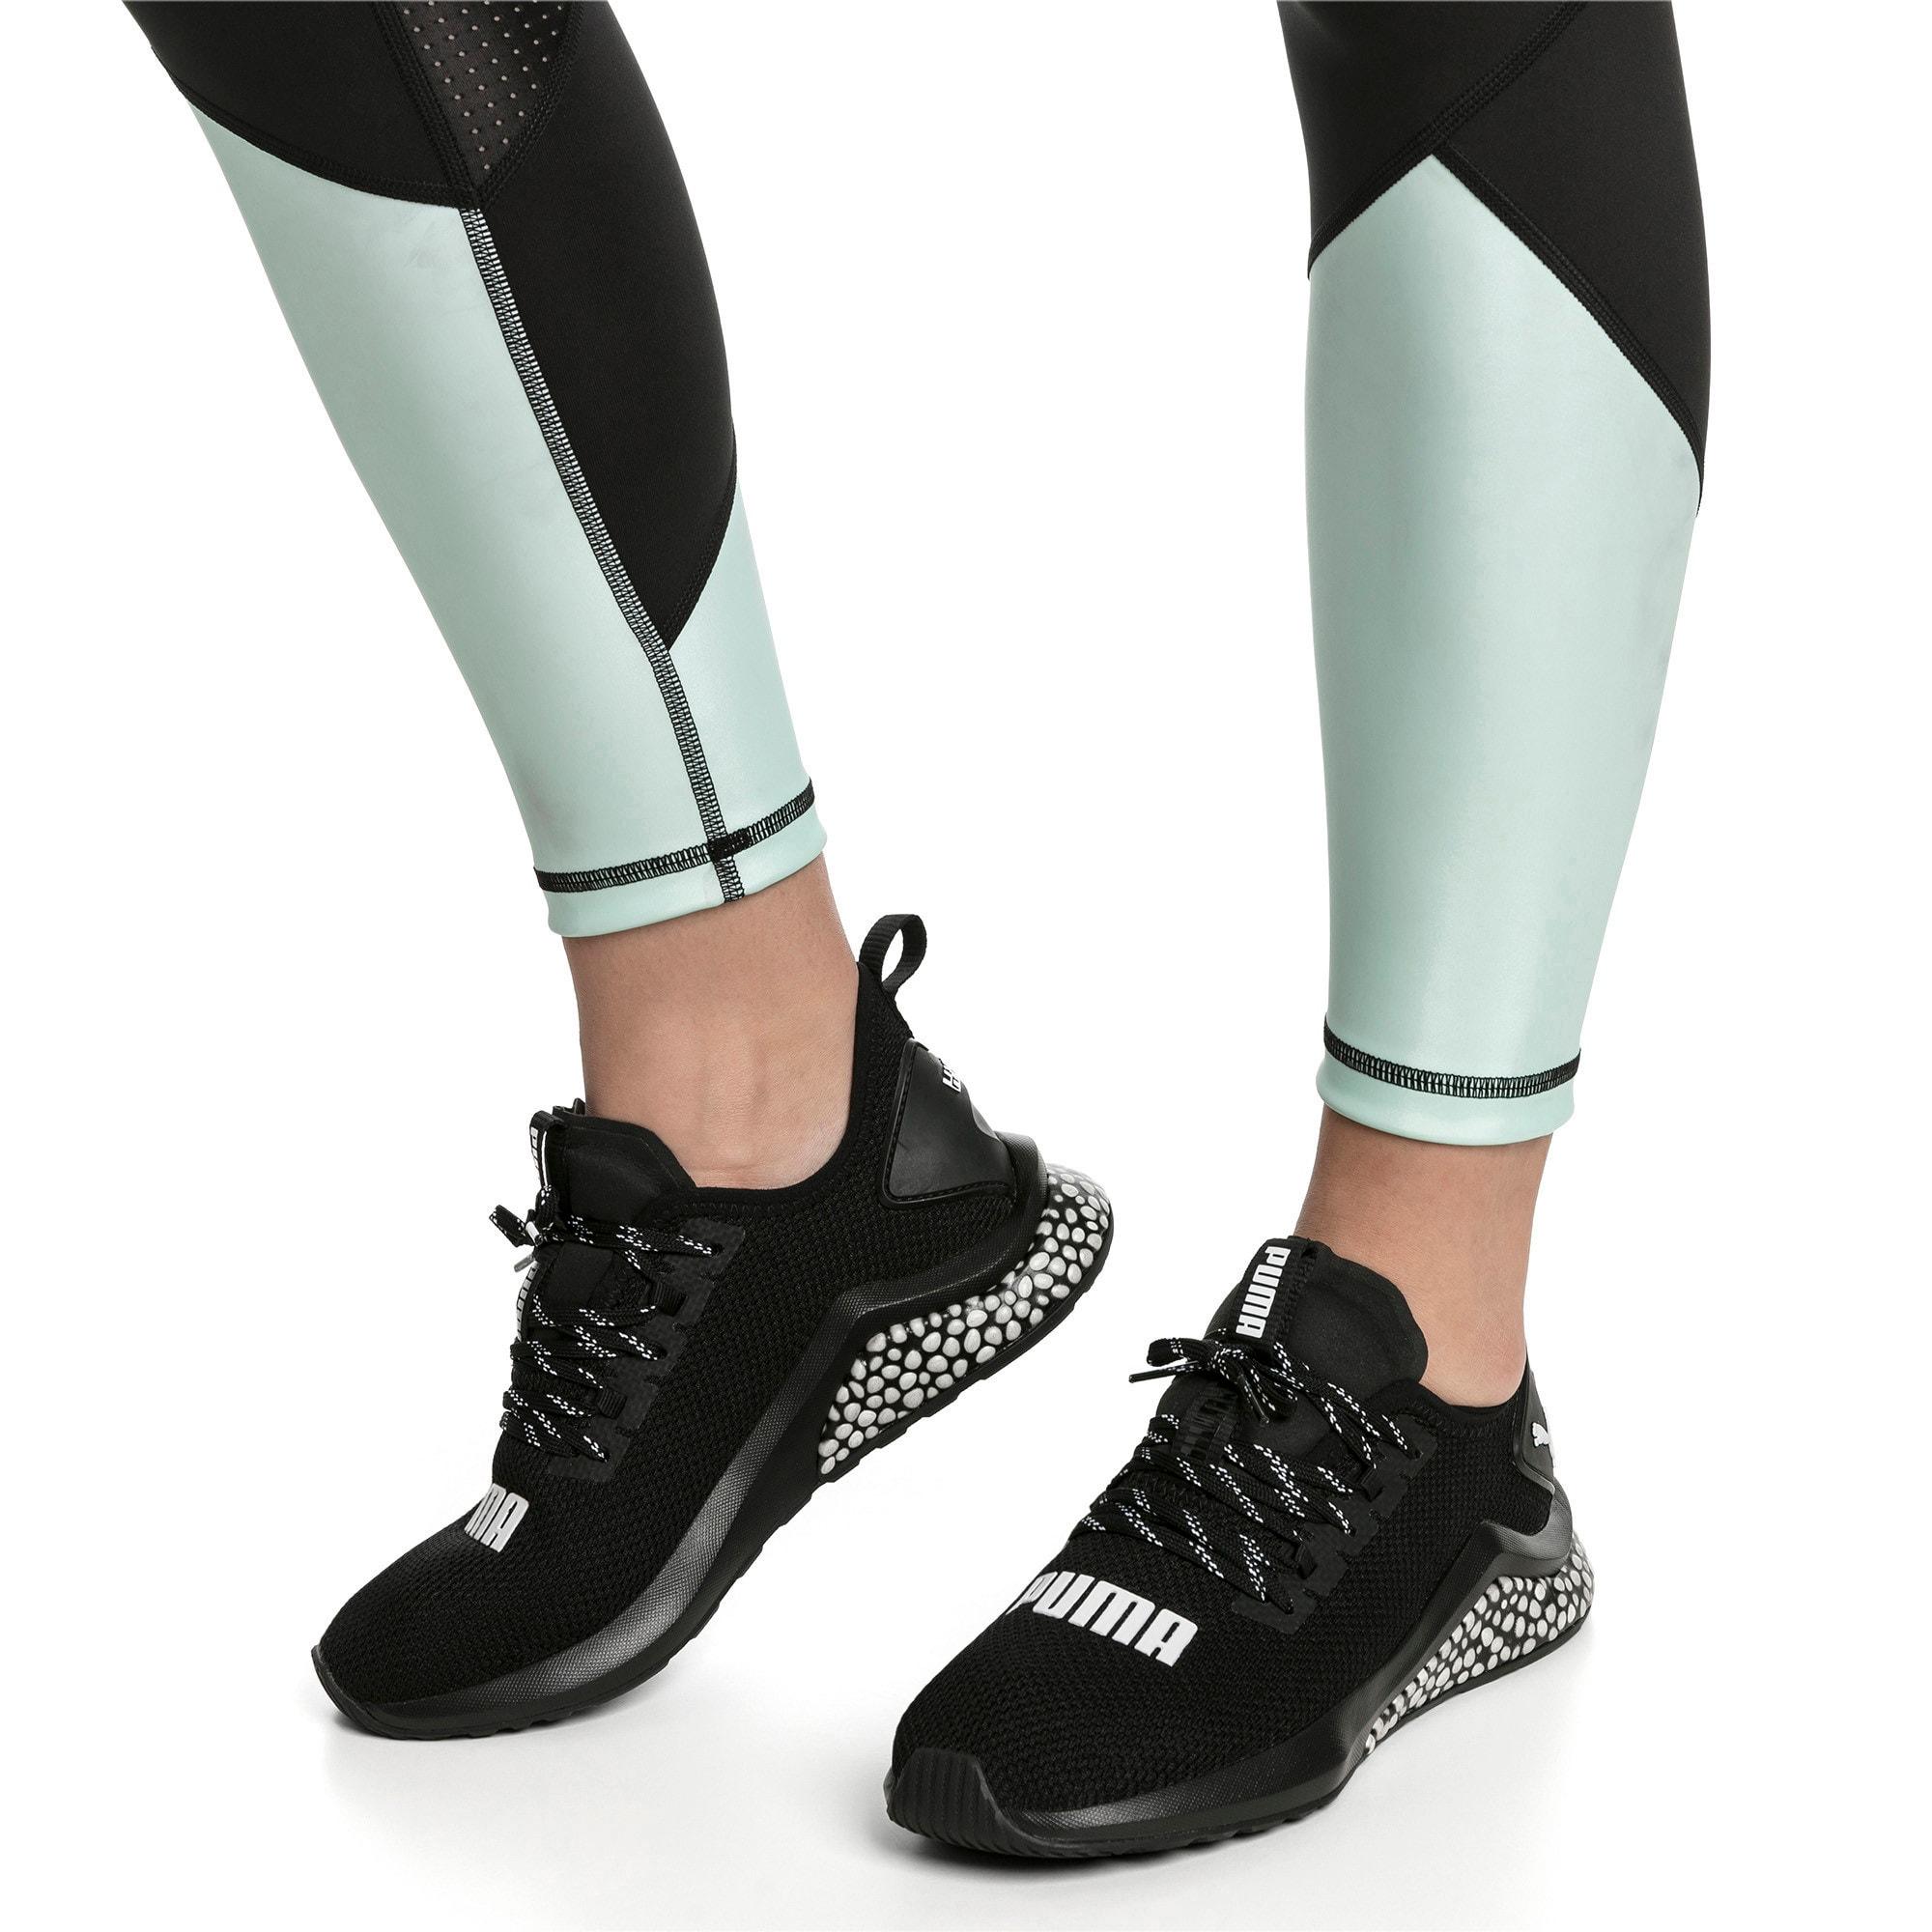 Thumbnail 2 of HYBRID NX Women's Running Shoes, Puma Black-Puma White, medium